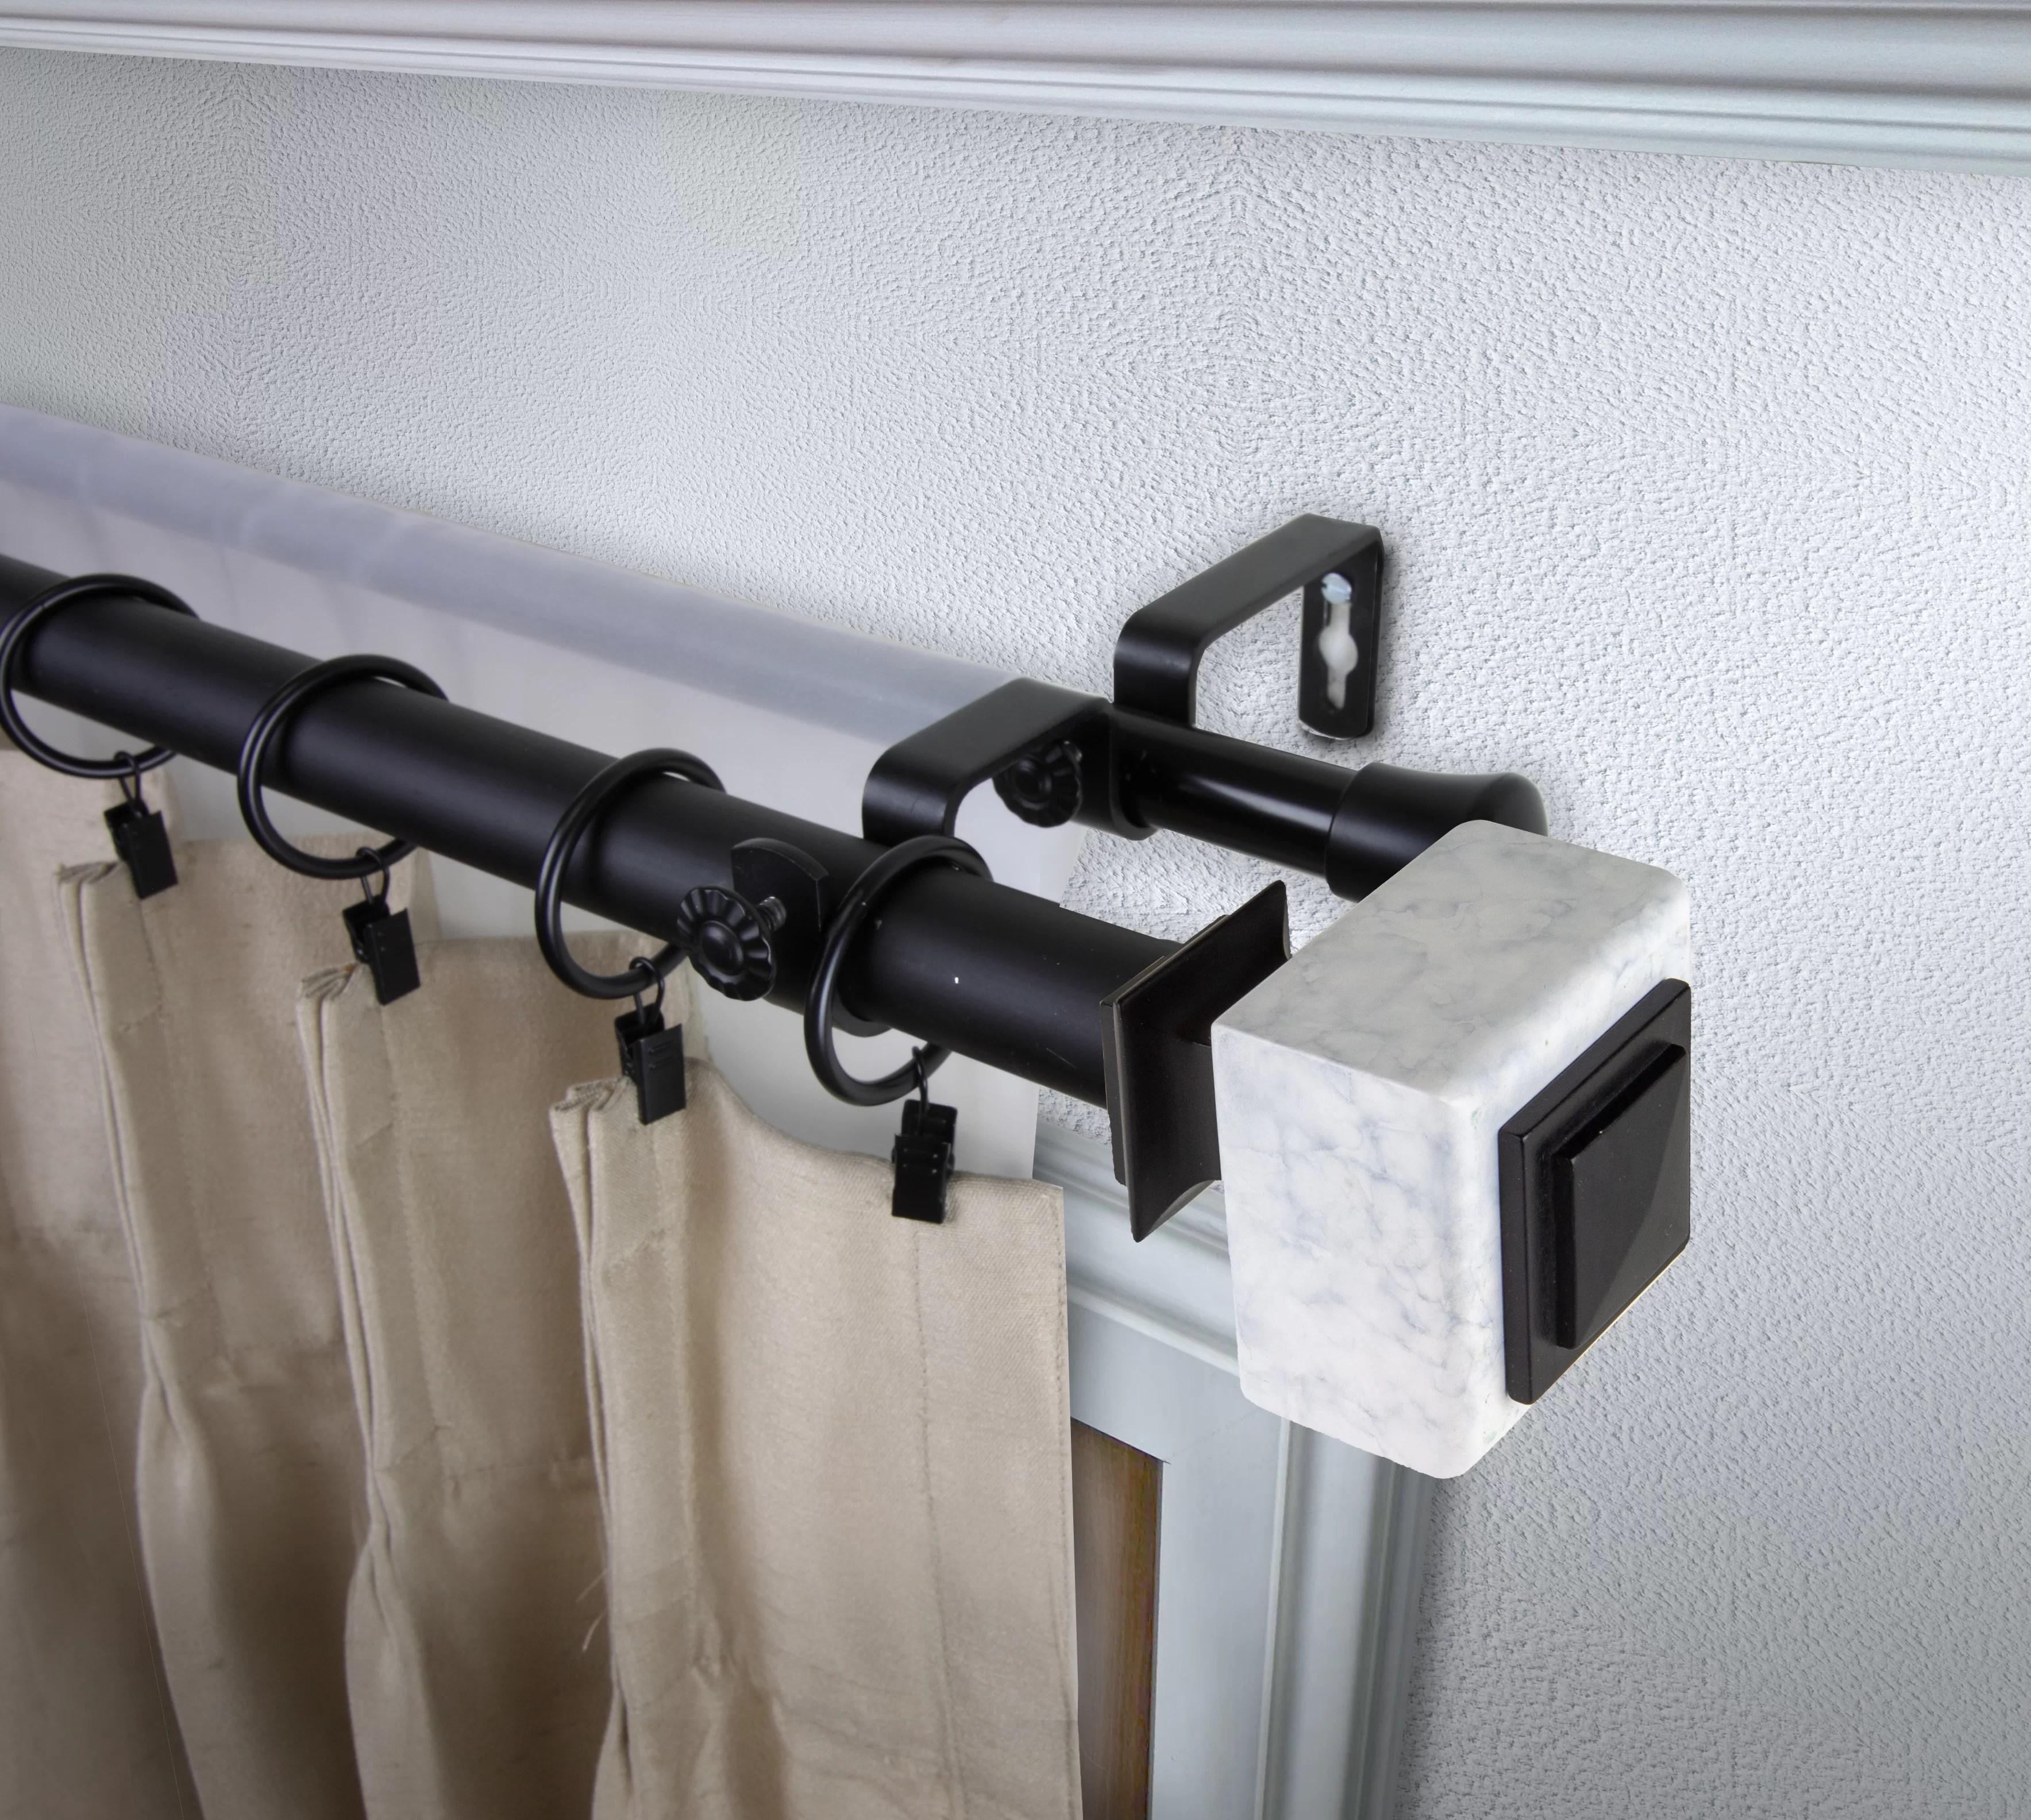 kathie double curtain rod